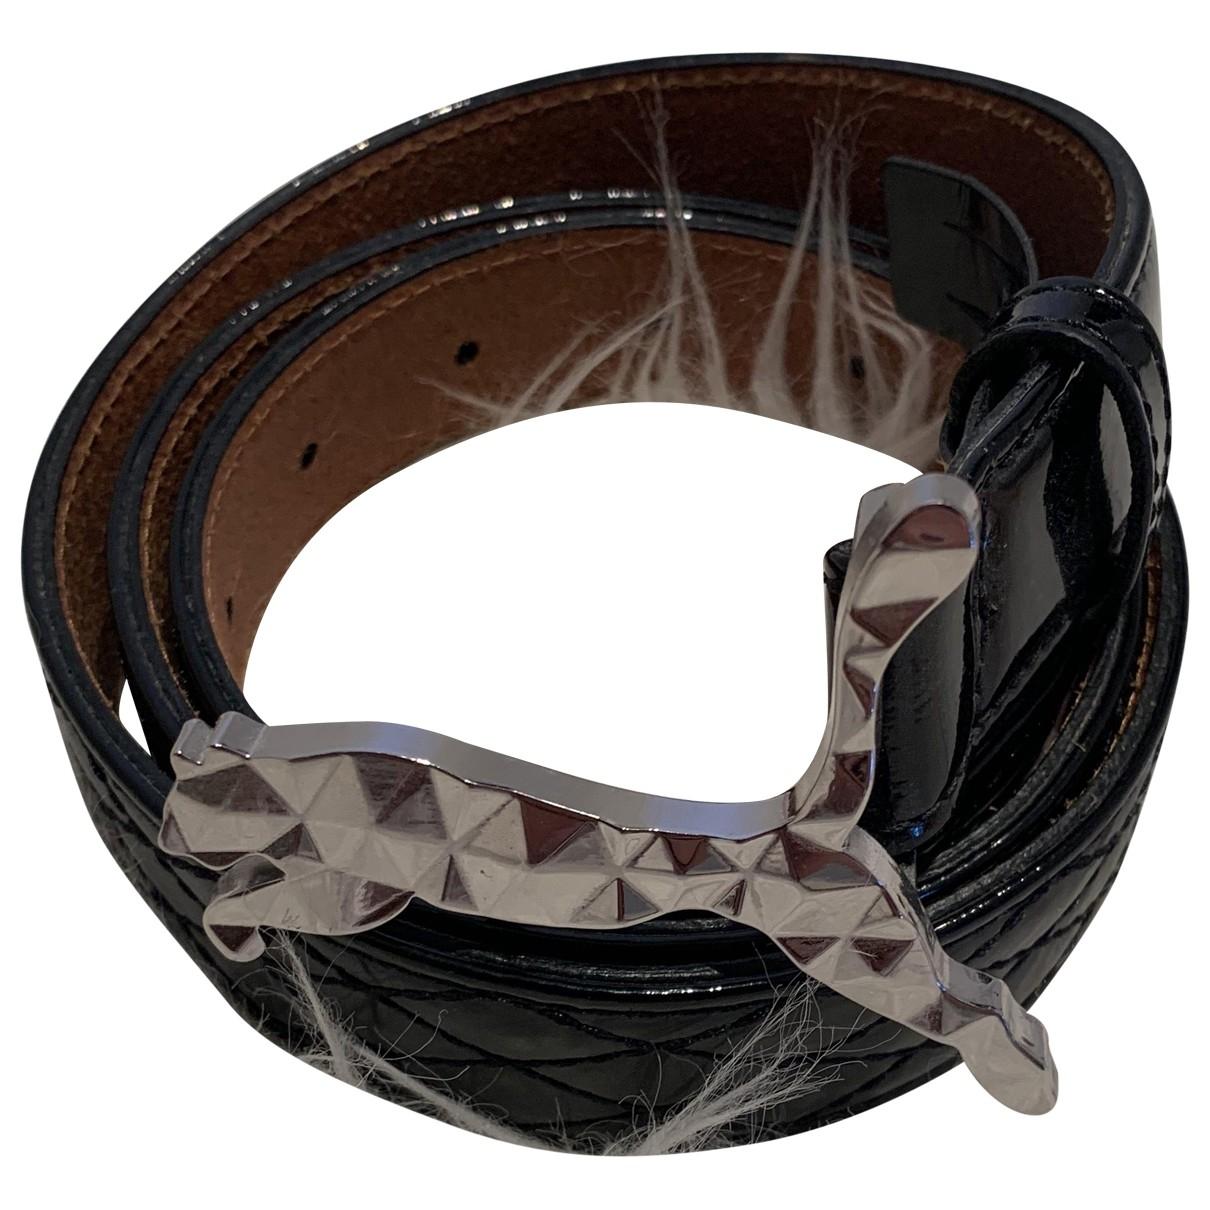 Puma \N Black Leather belt for Women M International